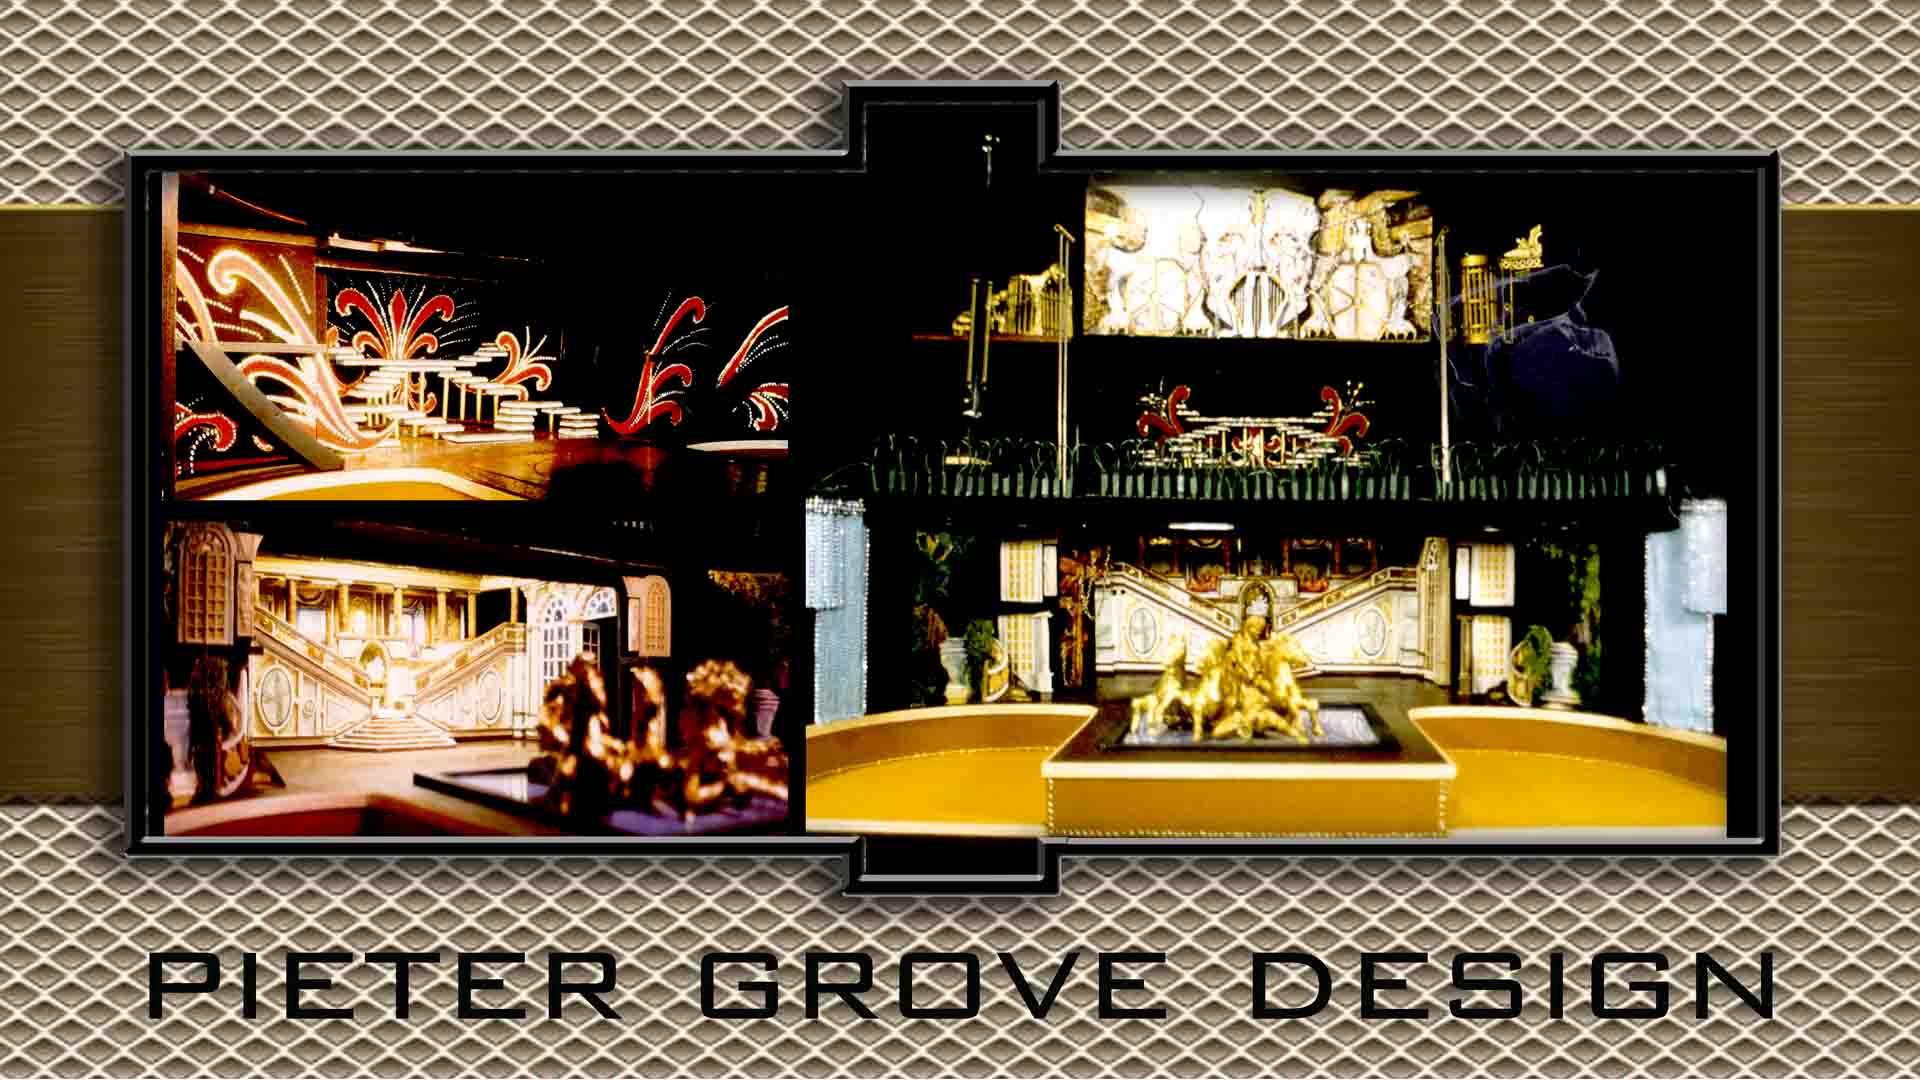 SET DESIGN MODEL - KA-LIDO-SCOPE_2 - Pieter Grove - LAS VEGAS